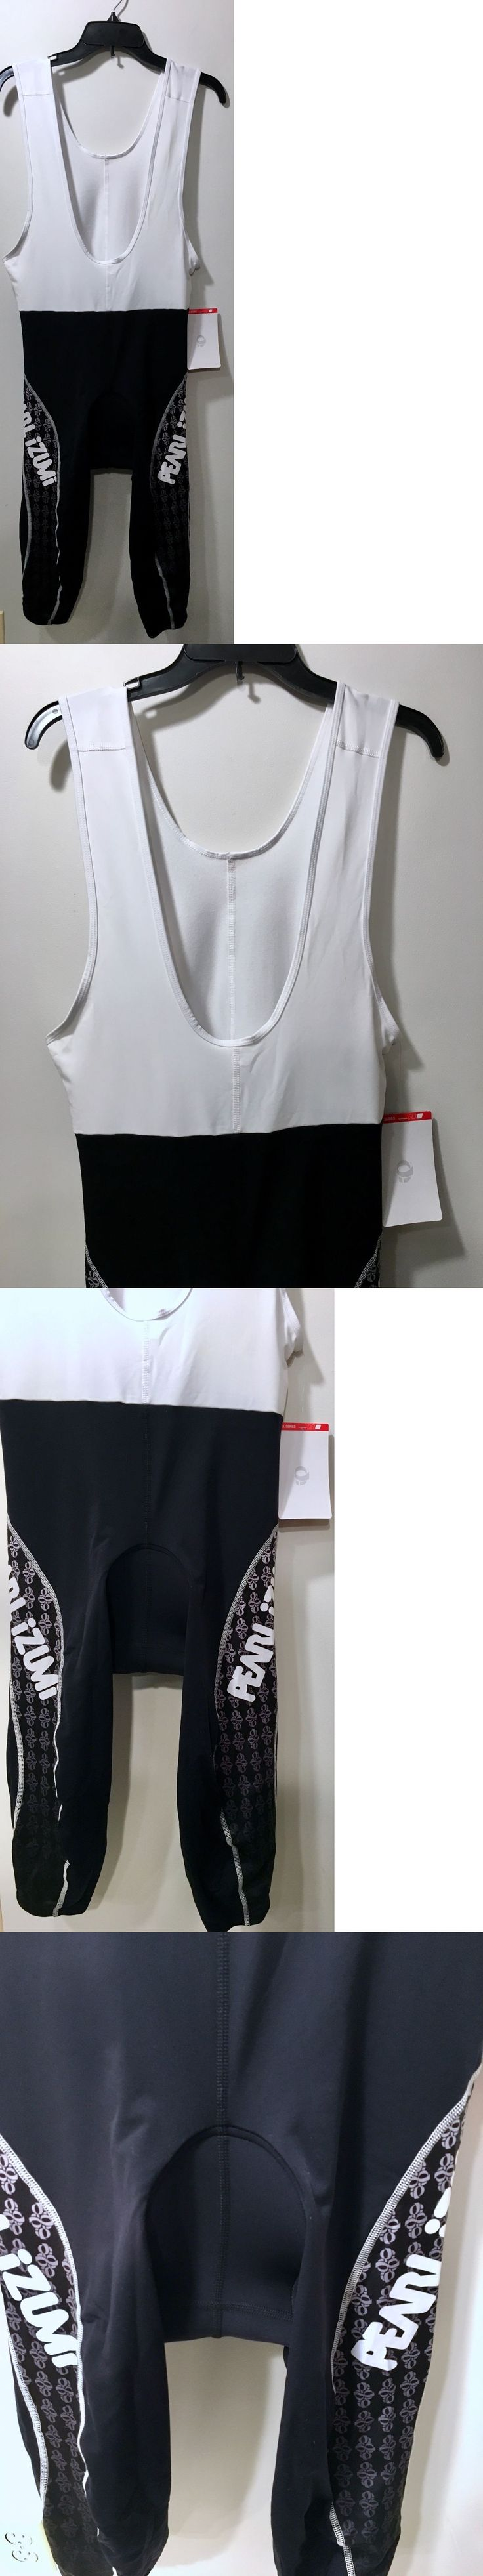 Shorts 177853: Pearl Izumi Mens Pro Custom Cycling Bib Knicker Thermal 3/4 Tight Black 2Xl Nwt -> BUY IT NOW ONLY: $69.95 on eBay!